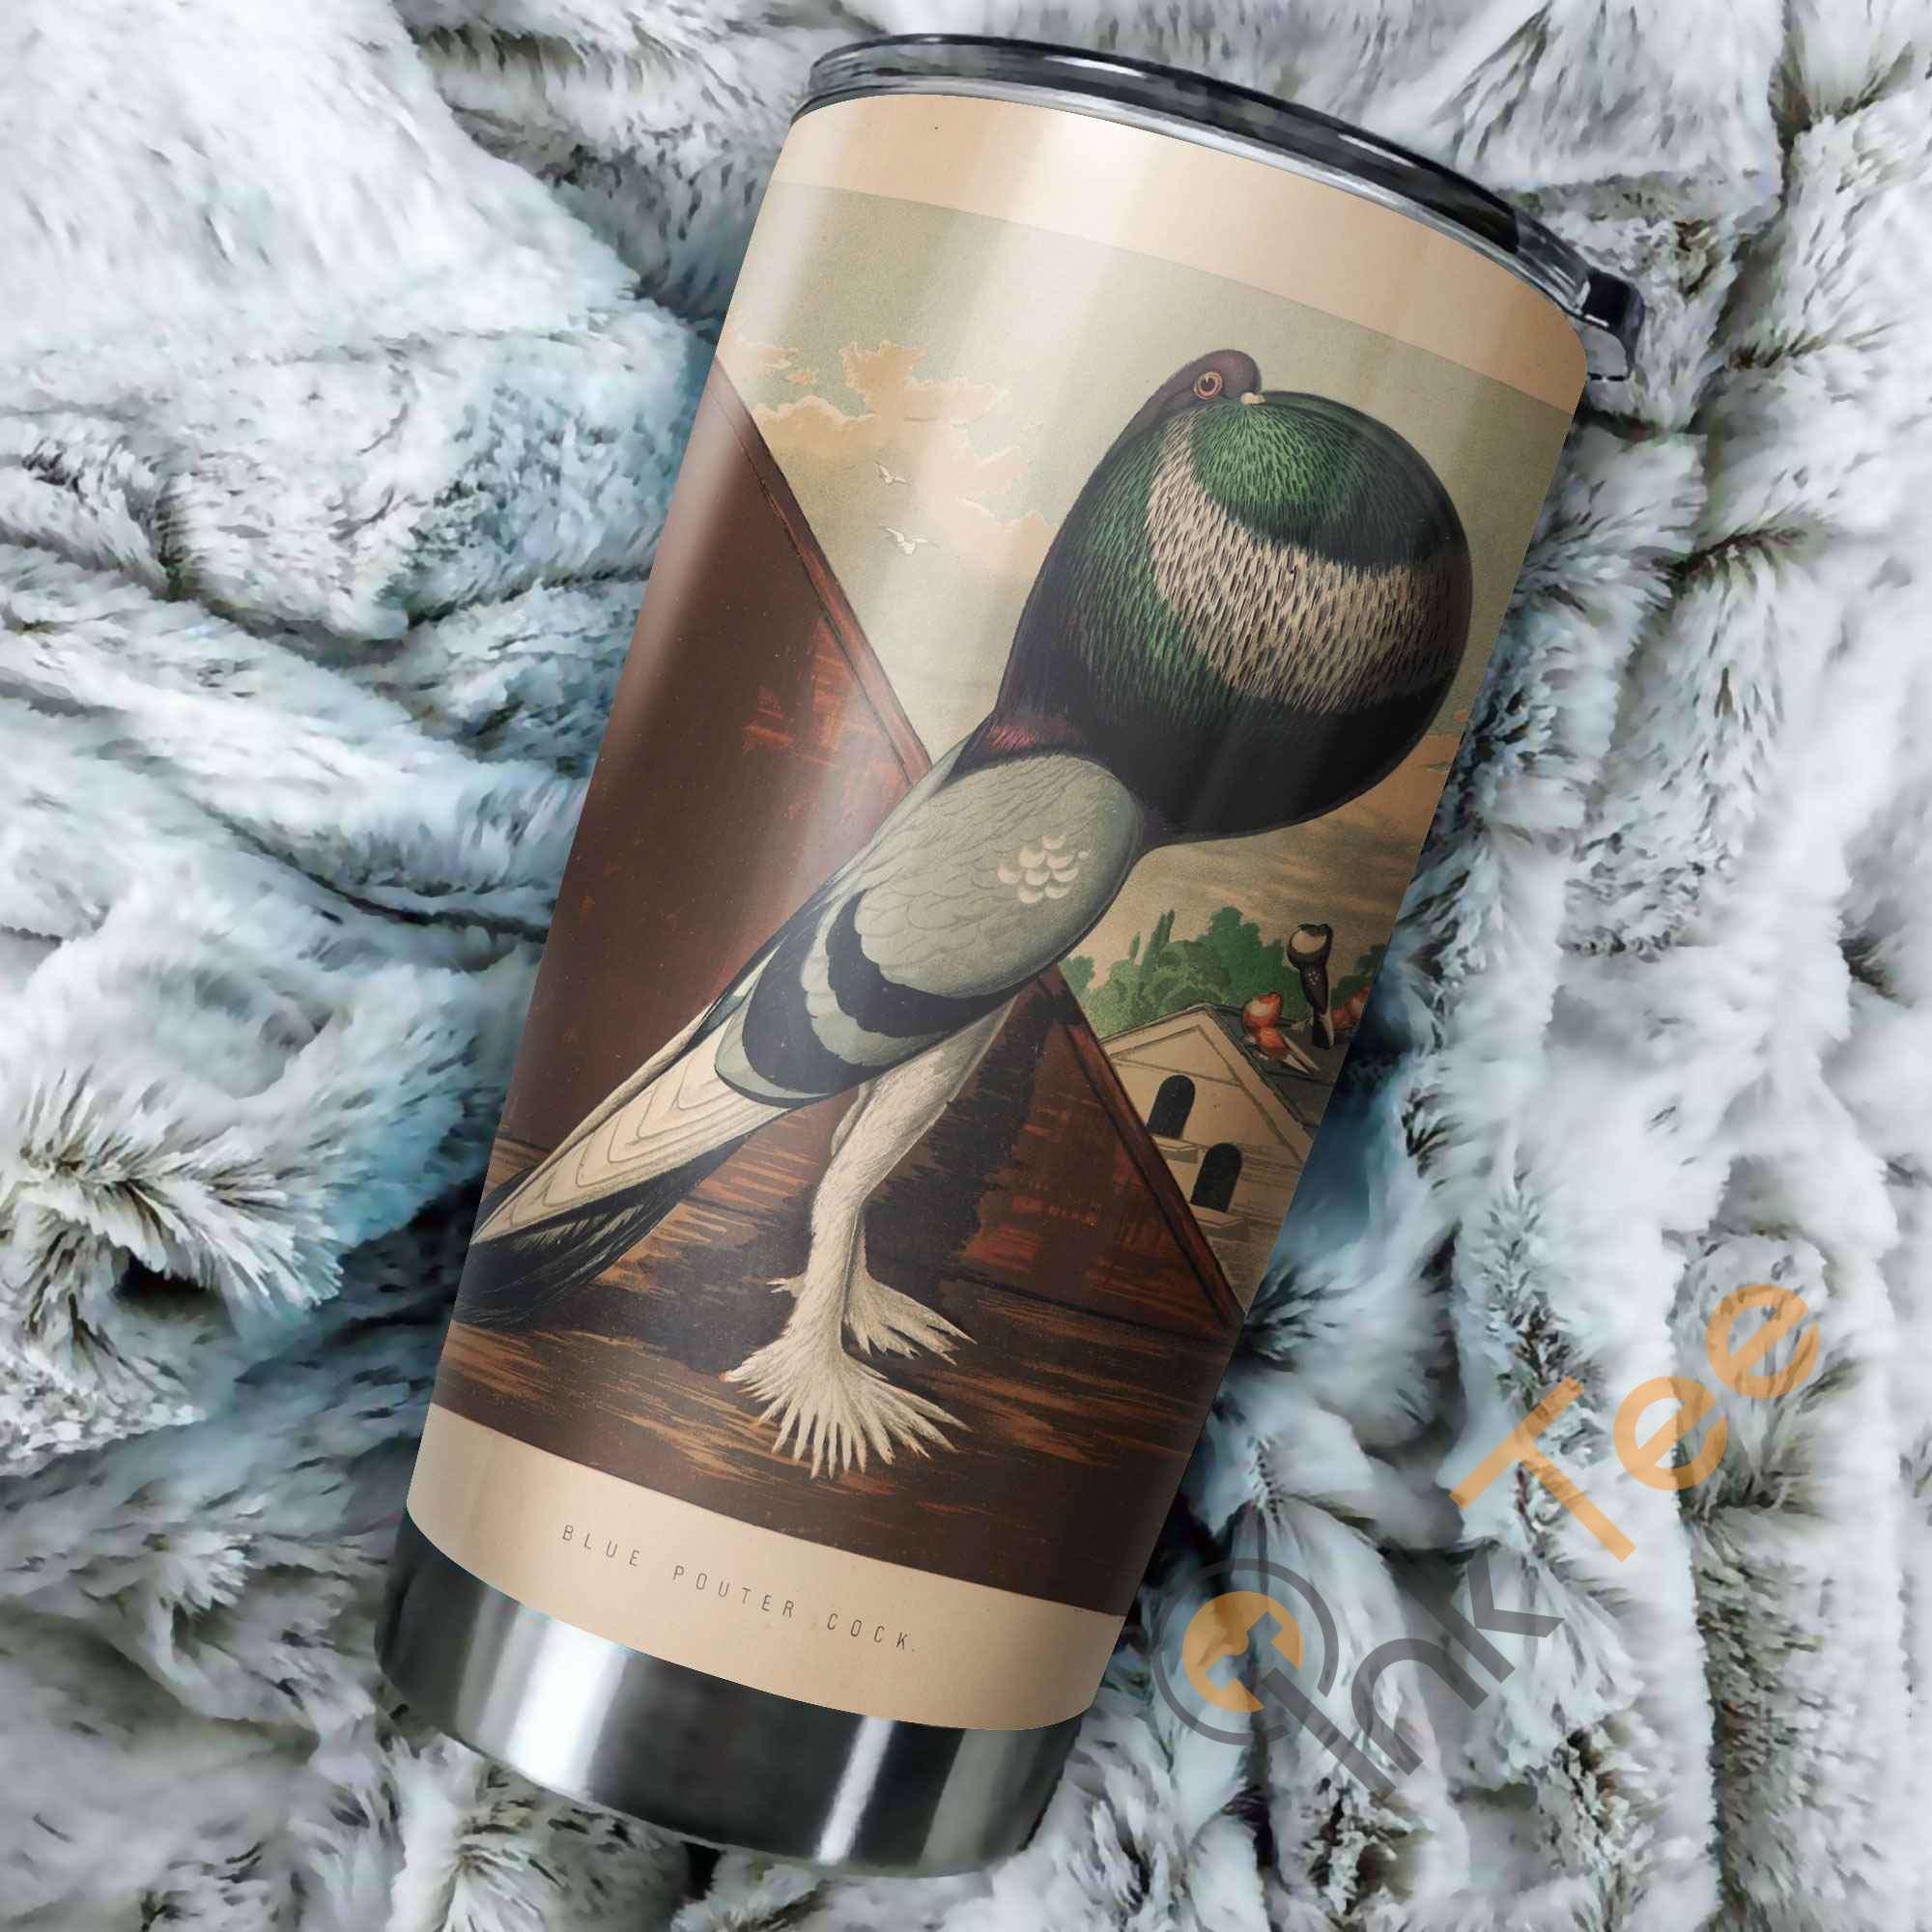 Beautiful Pigeon Amazon Best Seller Sku 3200 Stainless Steel Tumbler